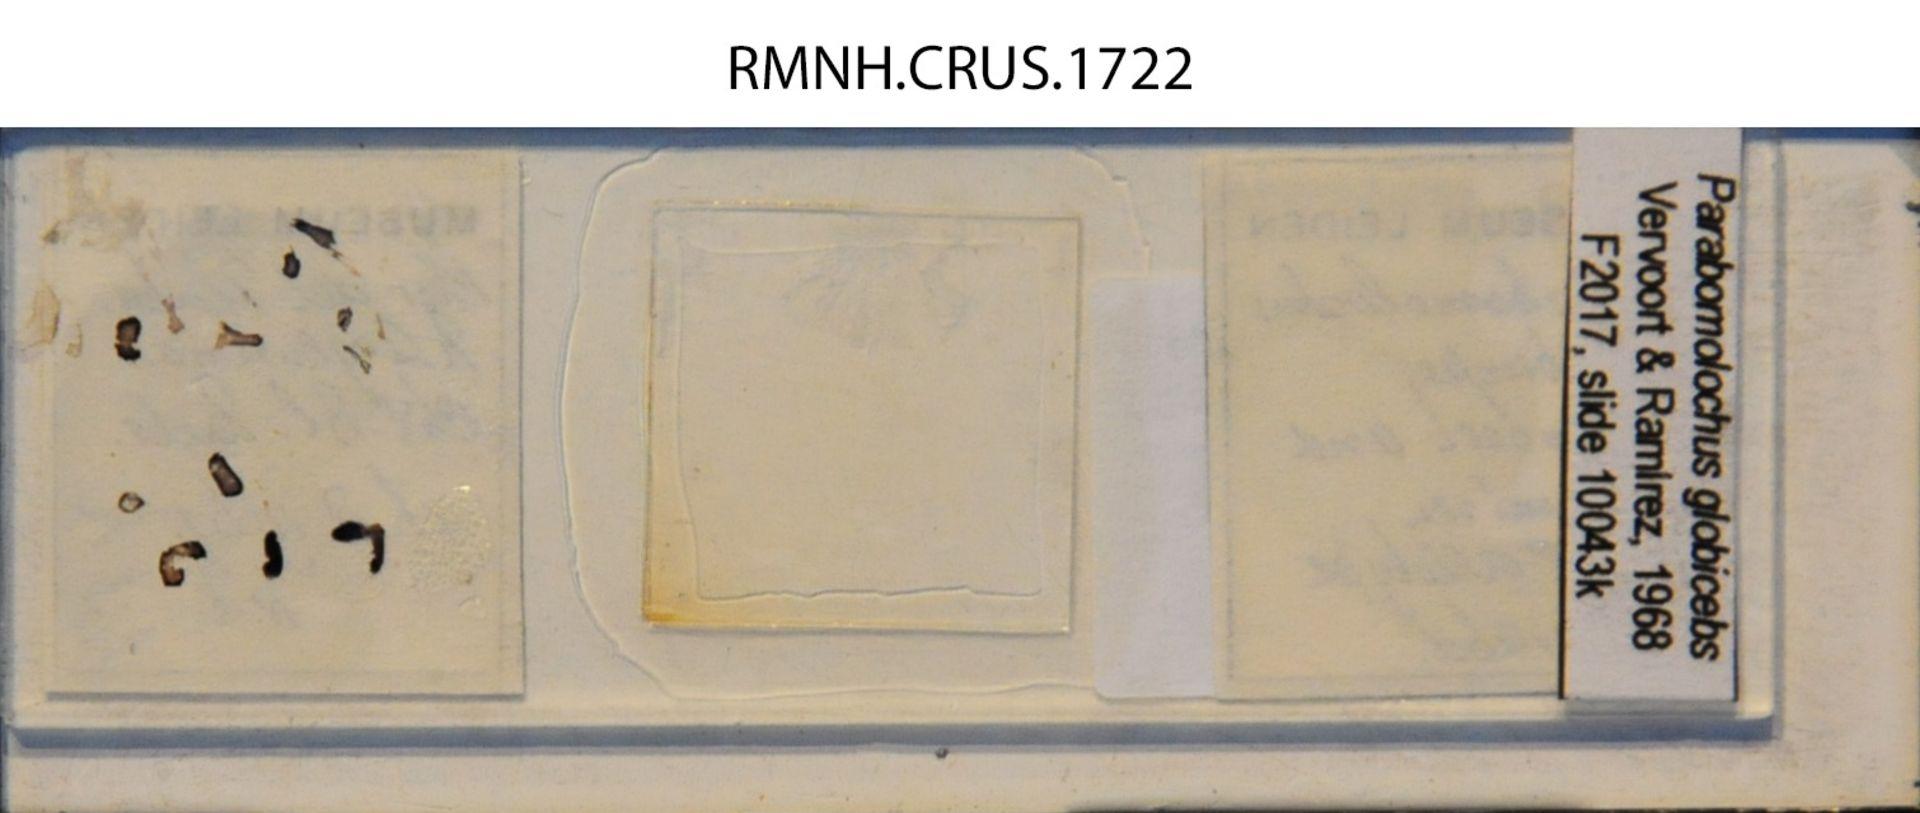 RMNH.CRUS.1722 | Parabomolochus globiceps Vervoort & Ramirez 1968